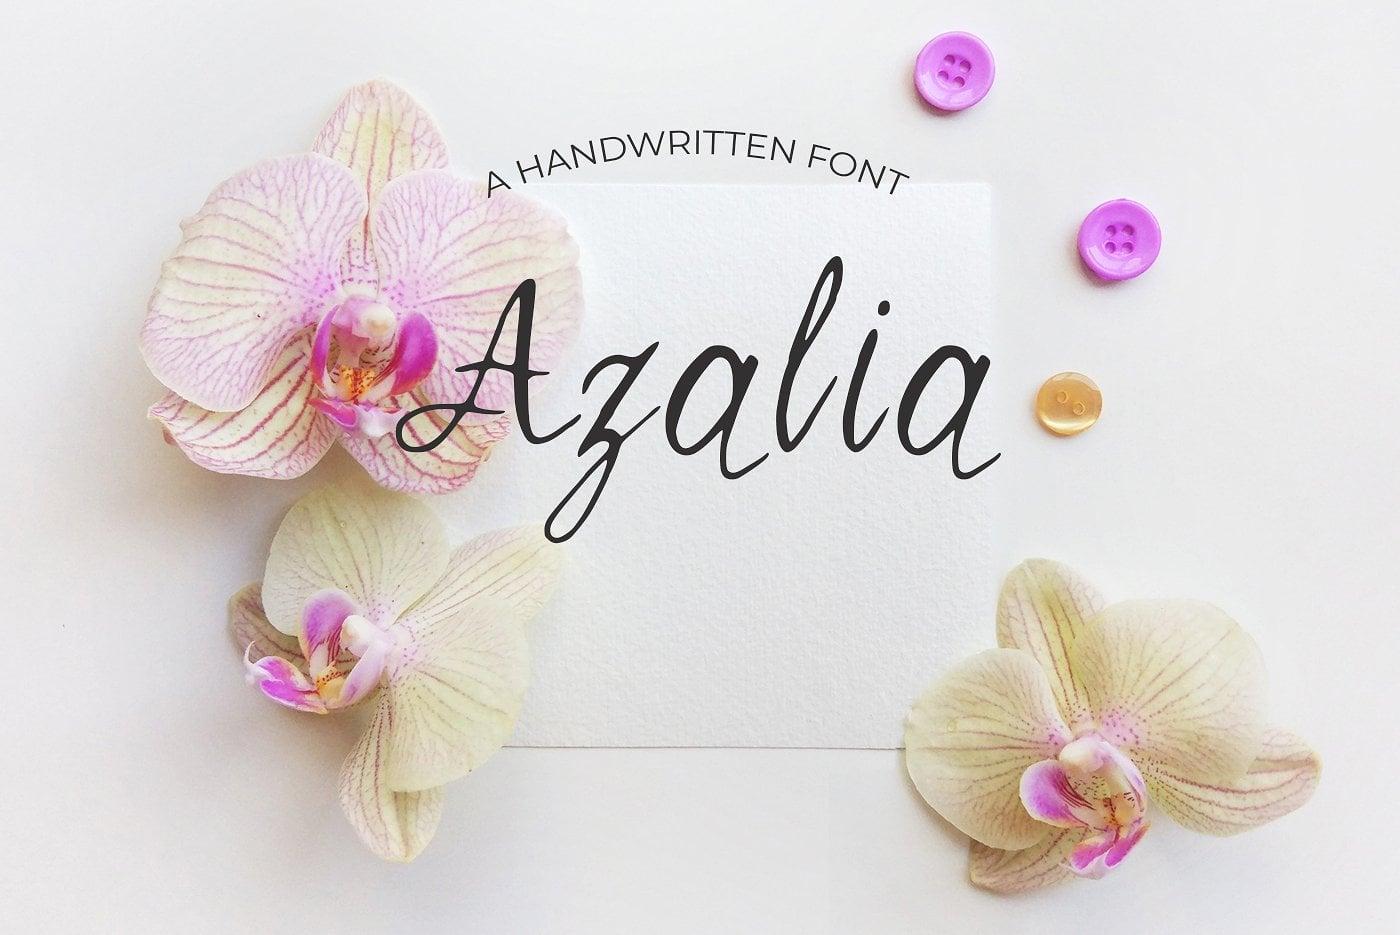 15 Creative Handmade Fonts - $19 ONLY - main image. 12